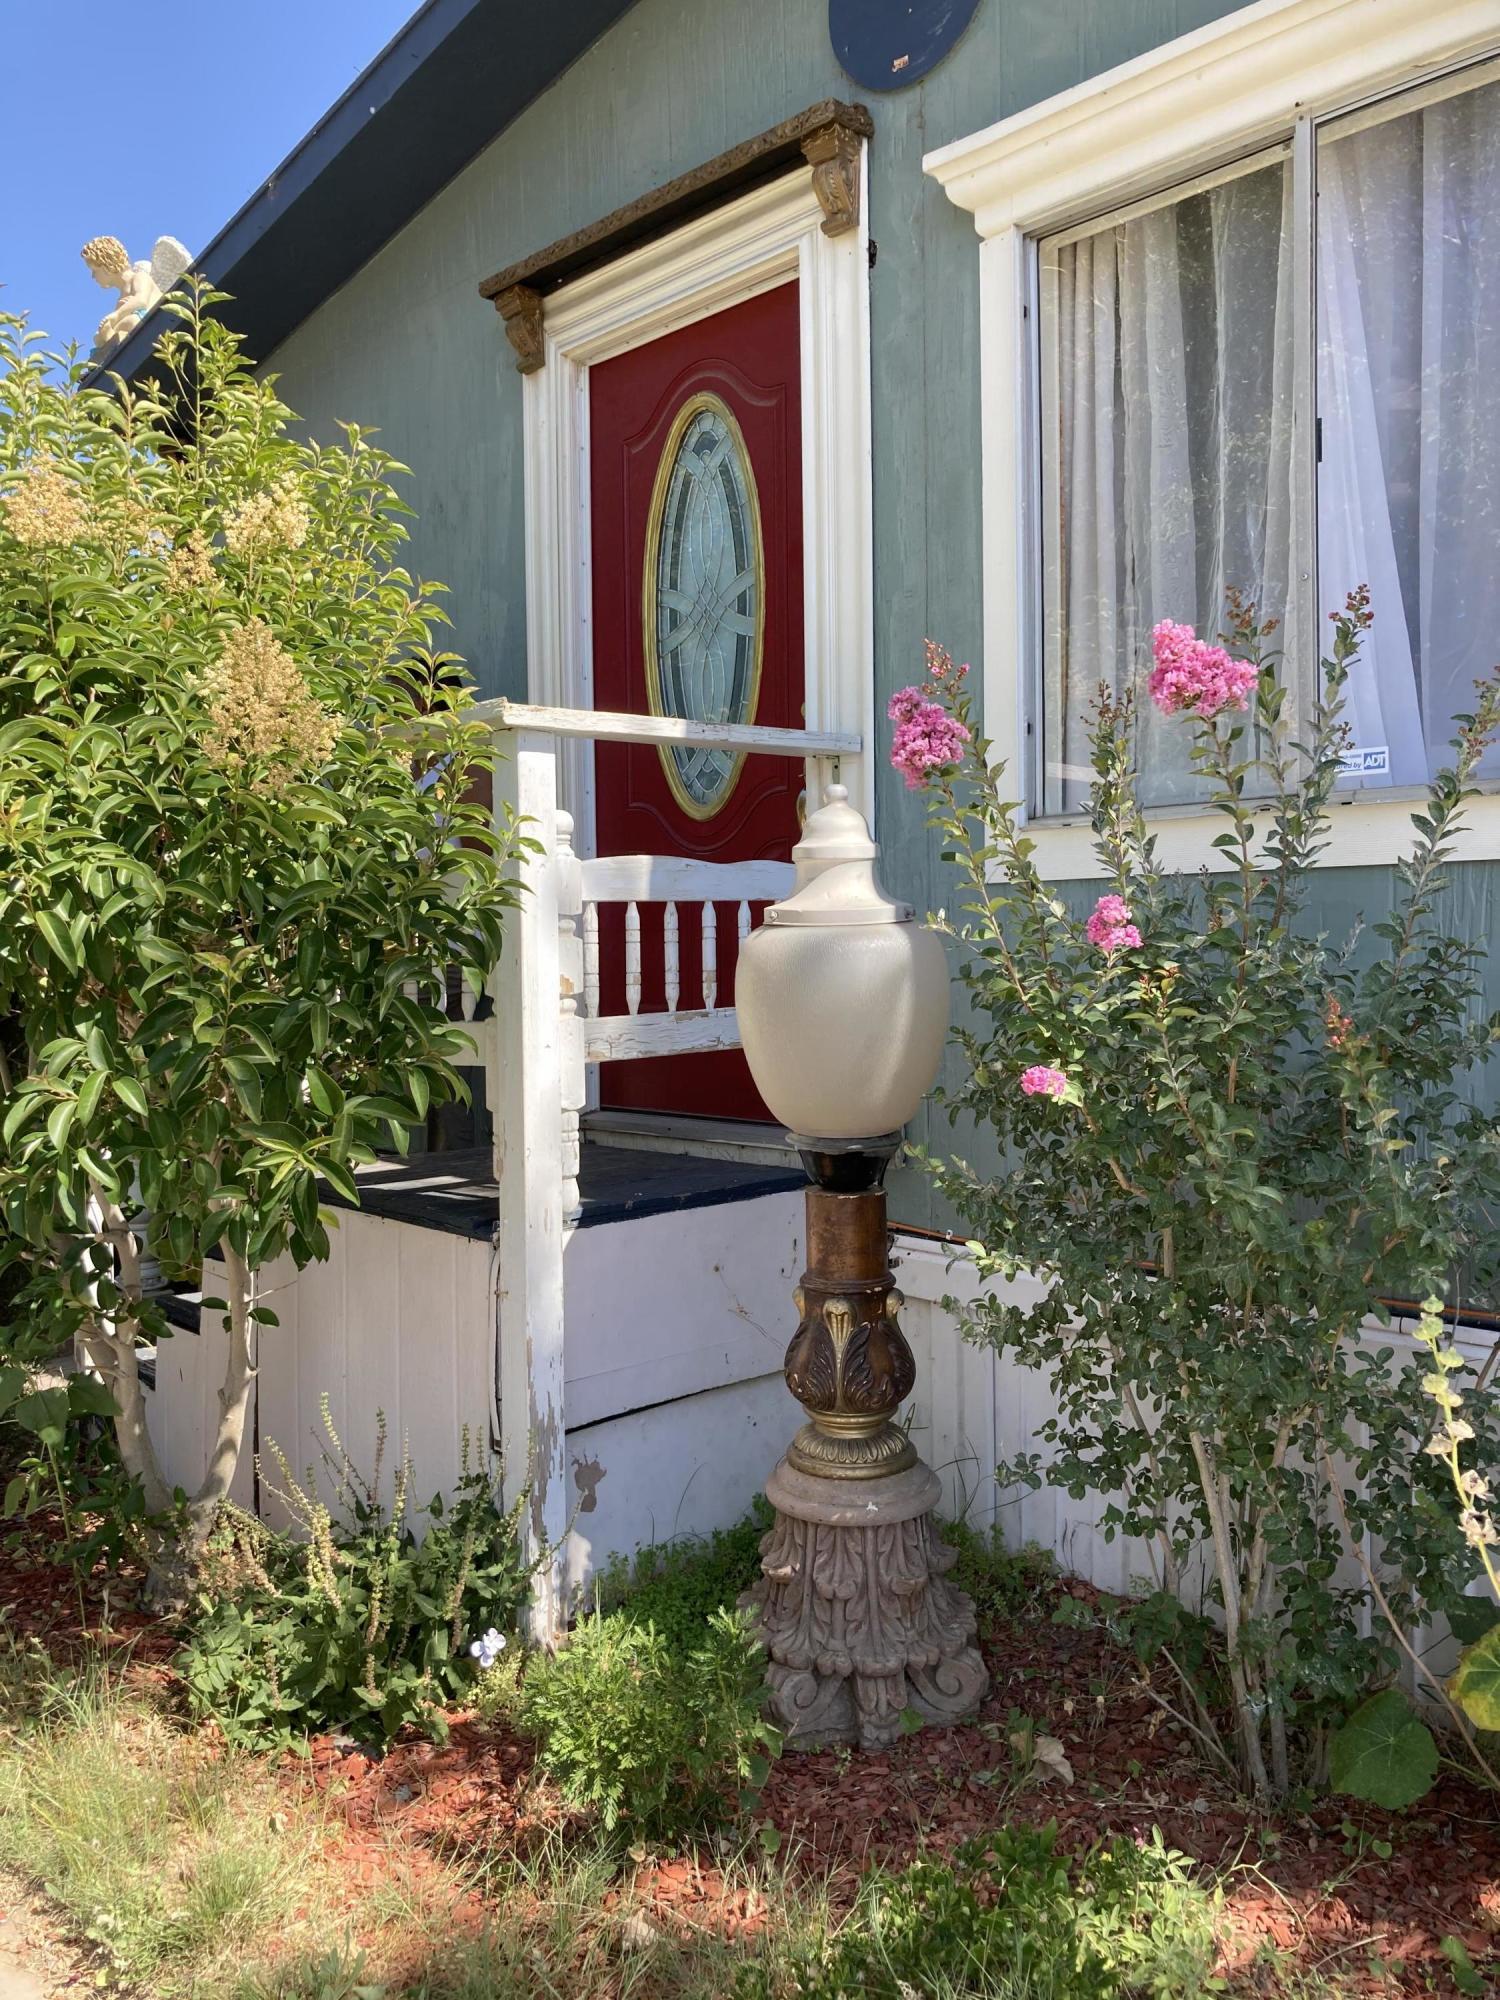 1301 E Avenue I, Lancaster in Los Angeles County, CA 93535 Home for Sale